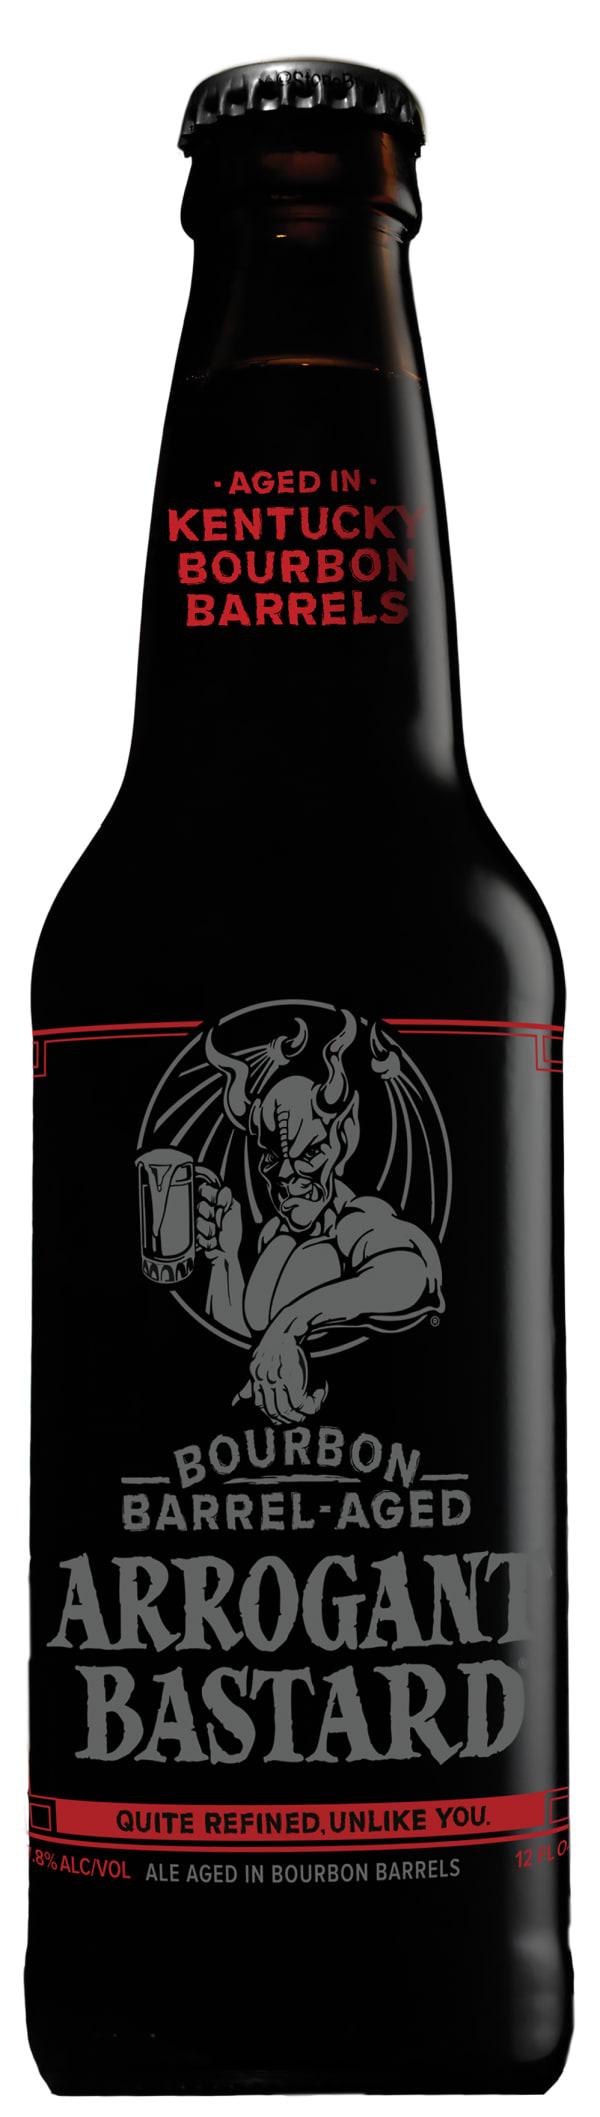 Stone Arrogant Bastard Bourbon Barrel-Aged